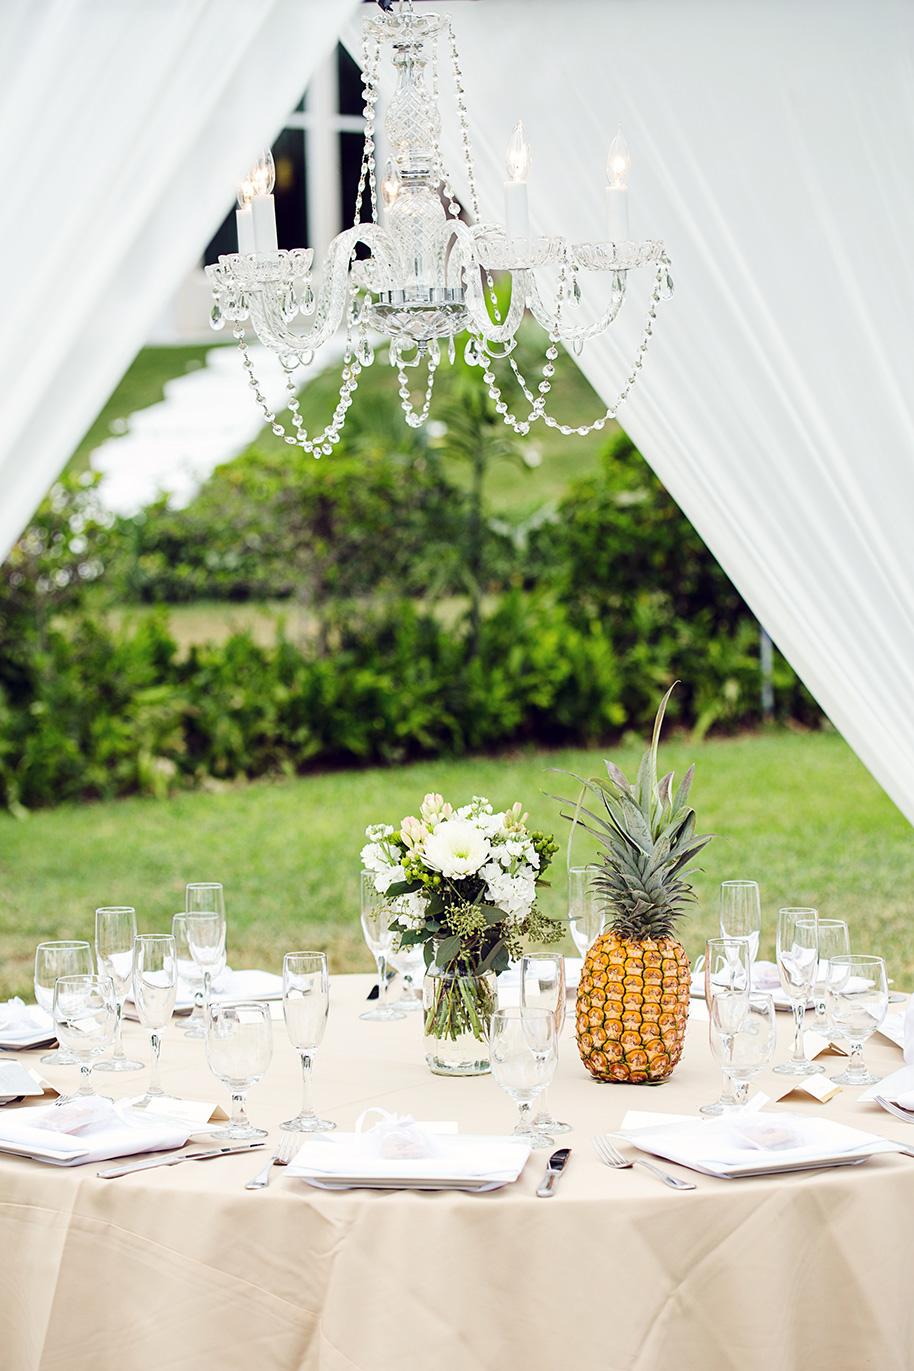 Paradise-Cove-Wedding-040816-16